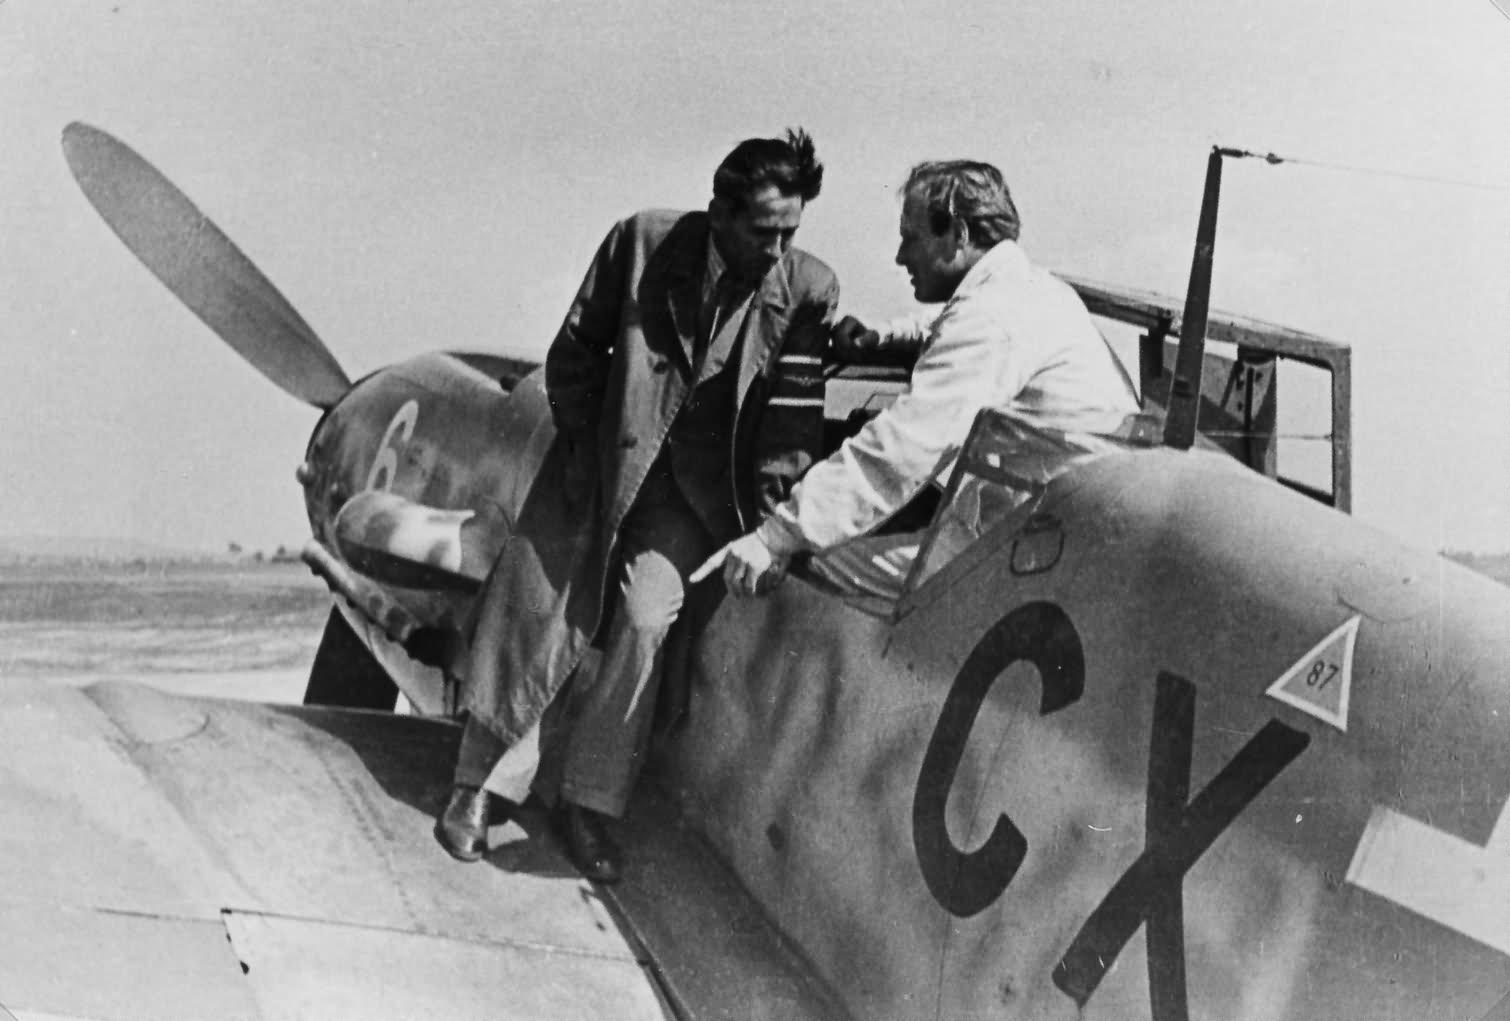 Messerschmitt Bf109 Wiener Neustadter Flugzeugwerke 130